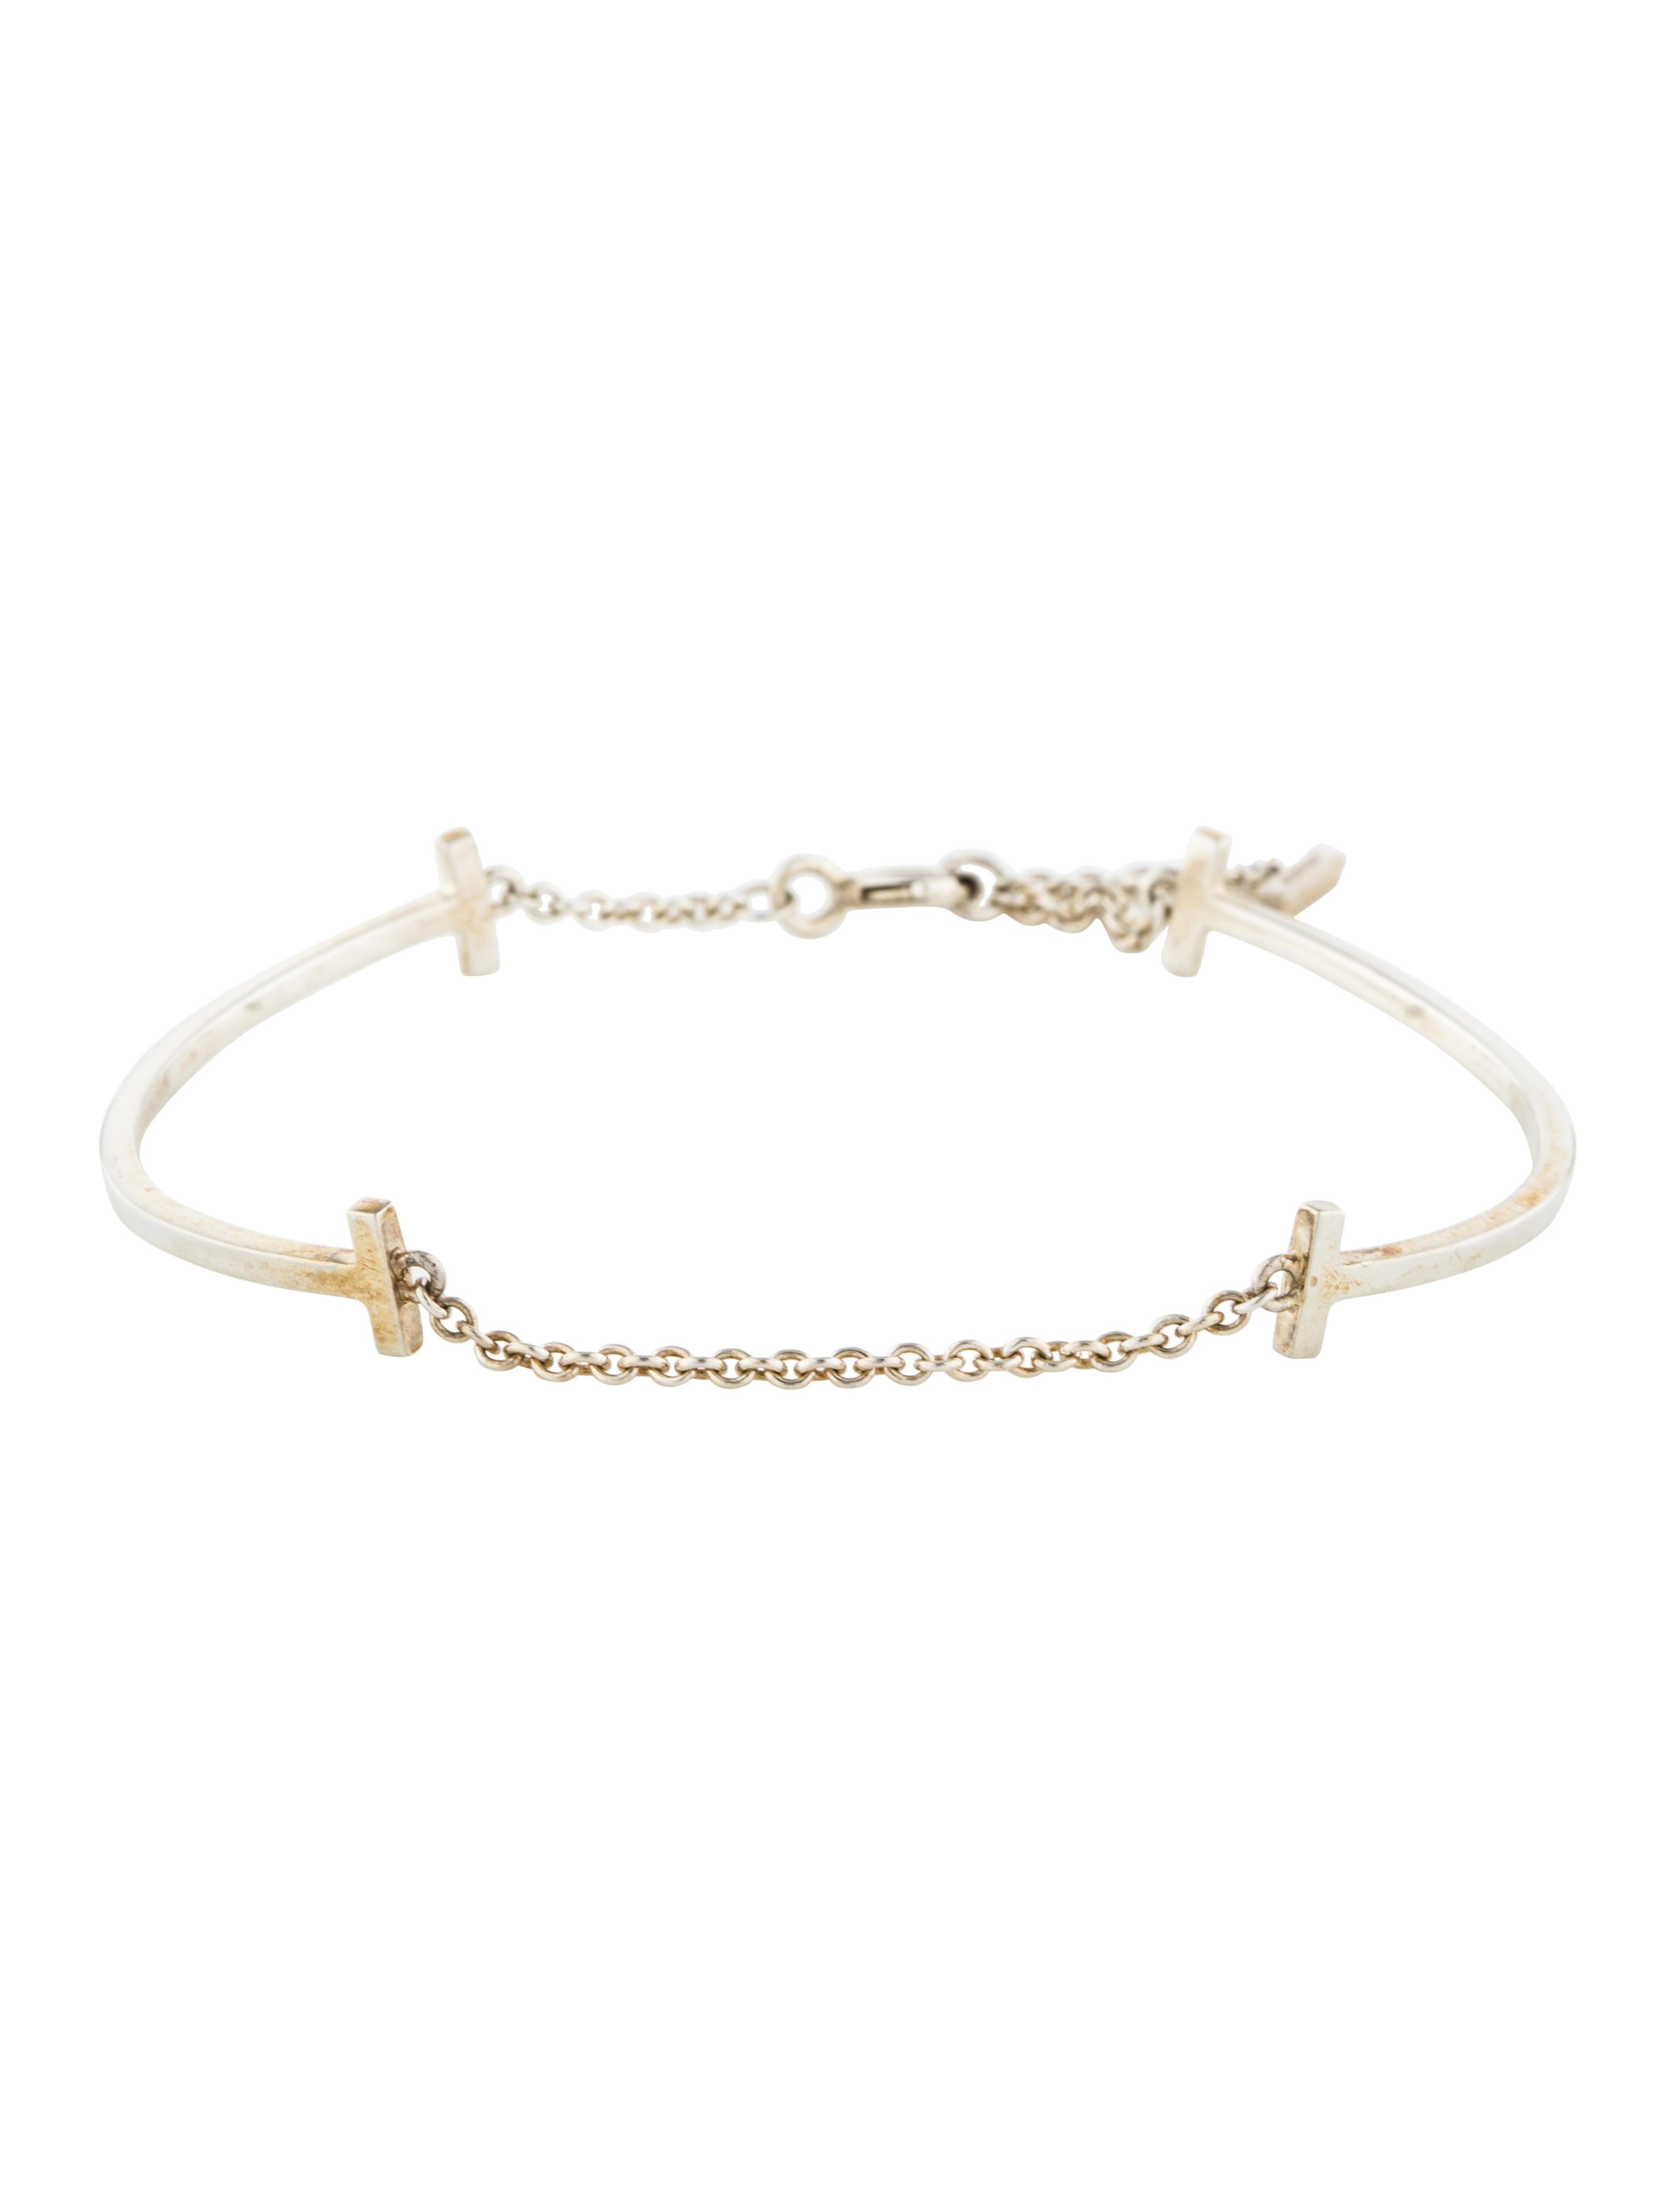 97559d723 Tiffany & Co. Double Smile Bracelet - Bracelets - TIF74157 | The ...